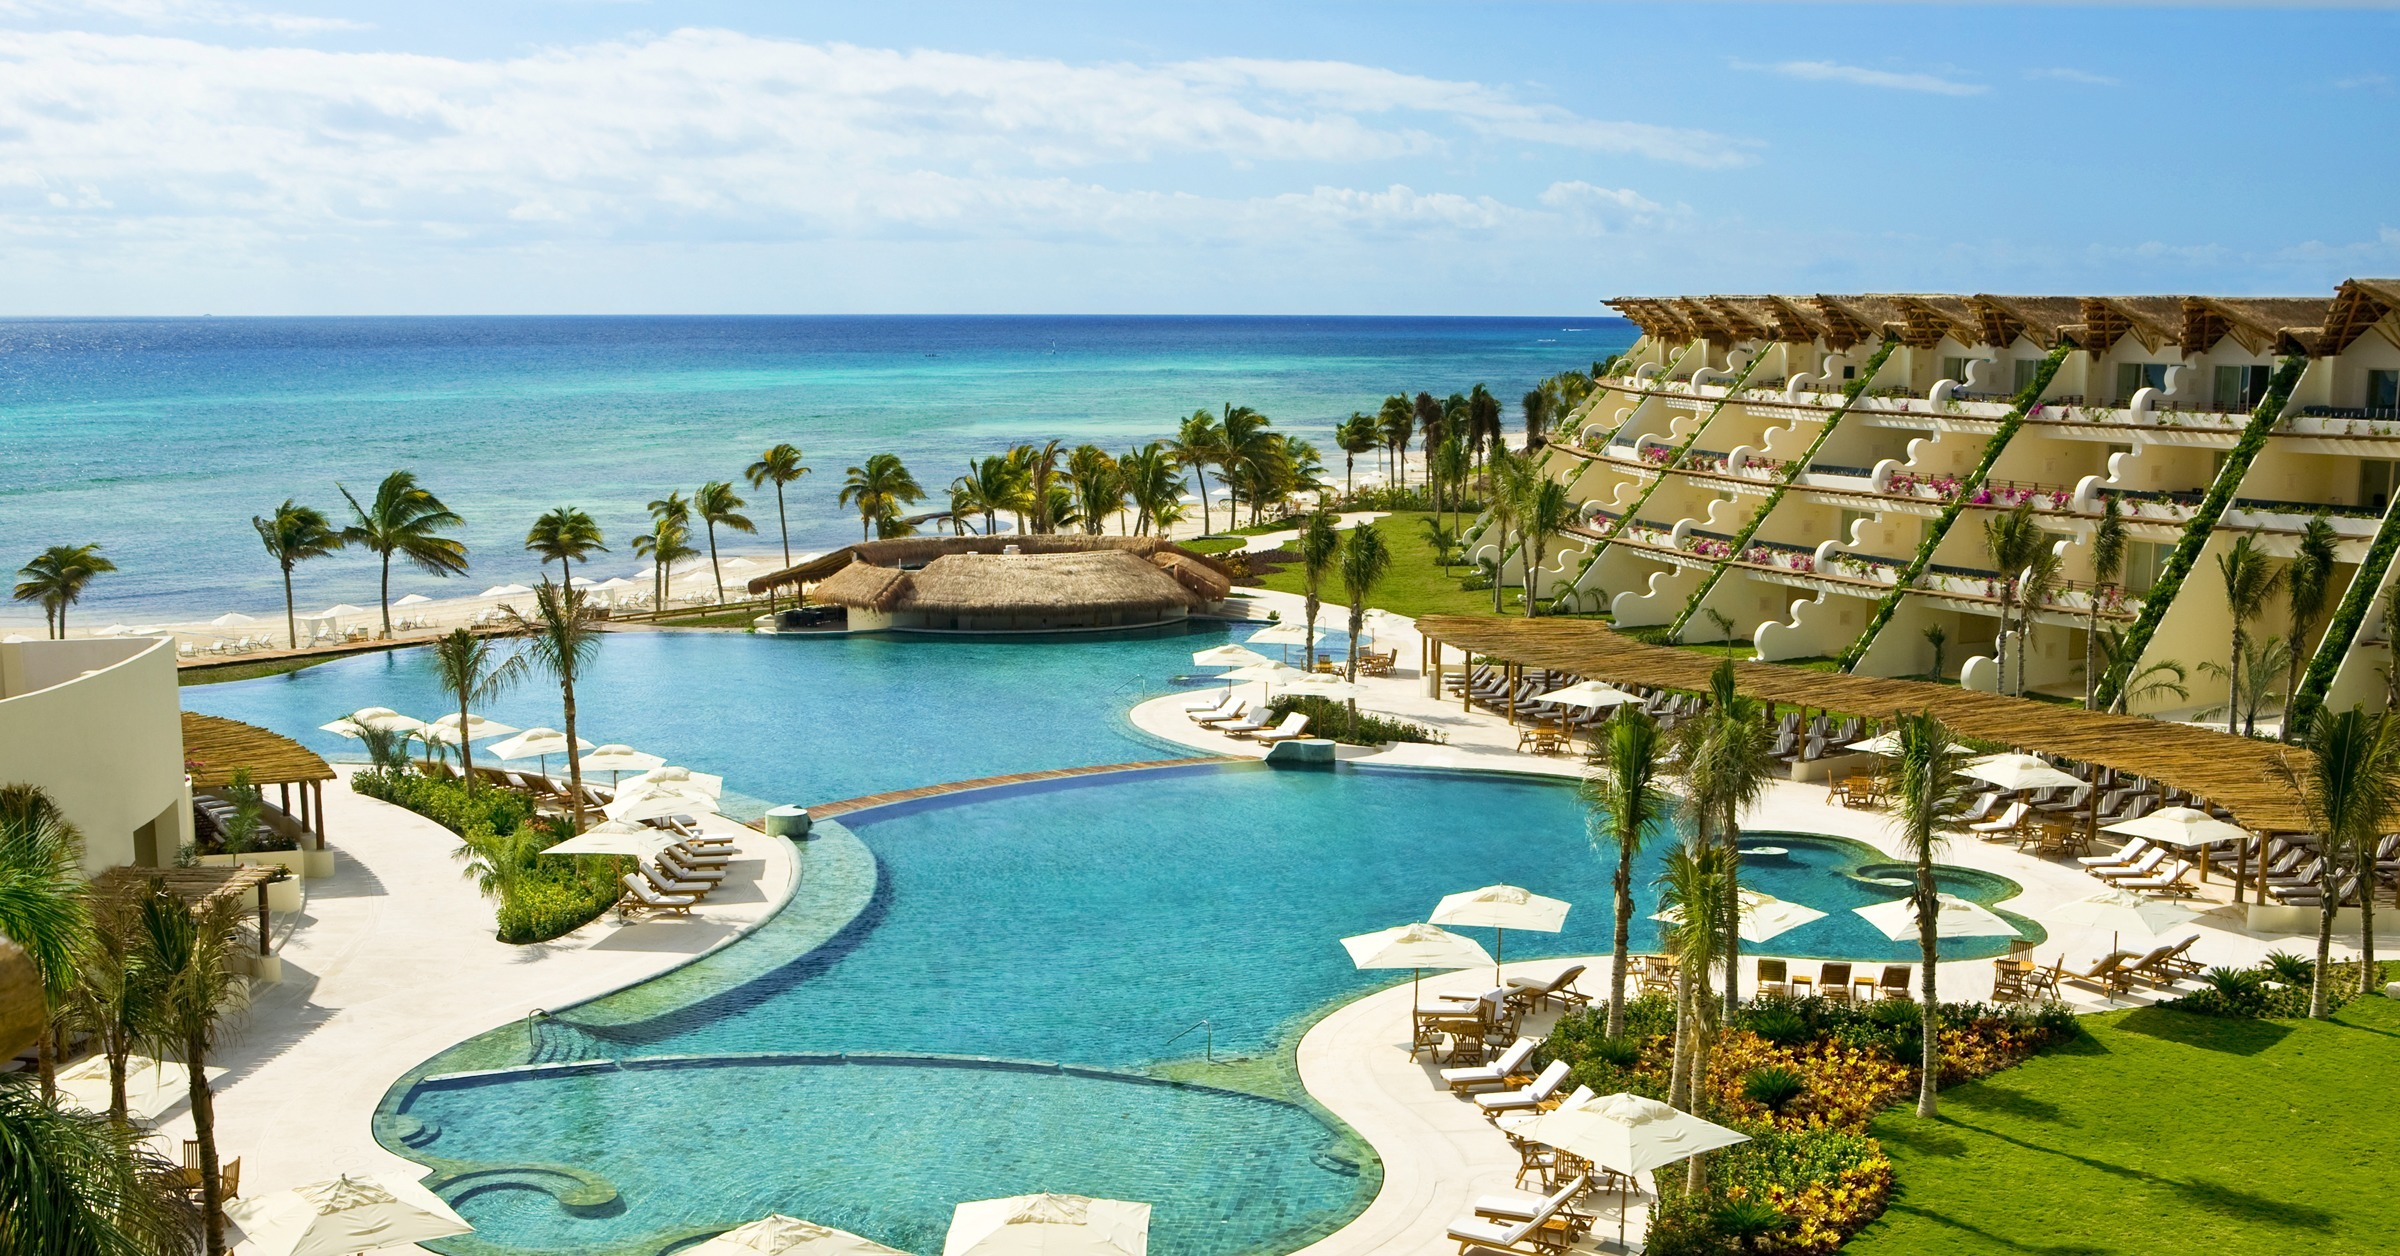 Playa del carmen riviera maya mexico the most amazing for Amazing all inclusive resorts